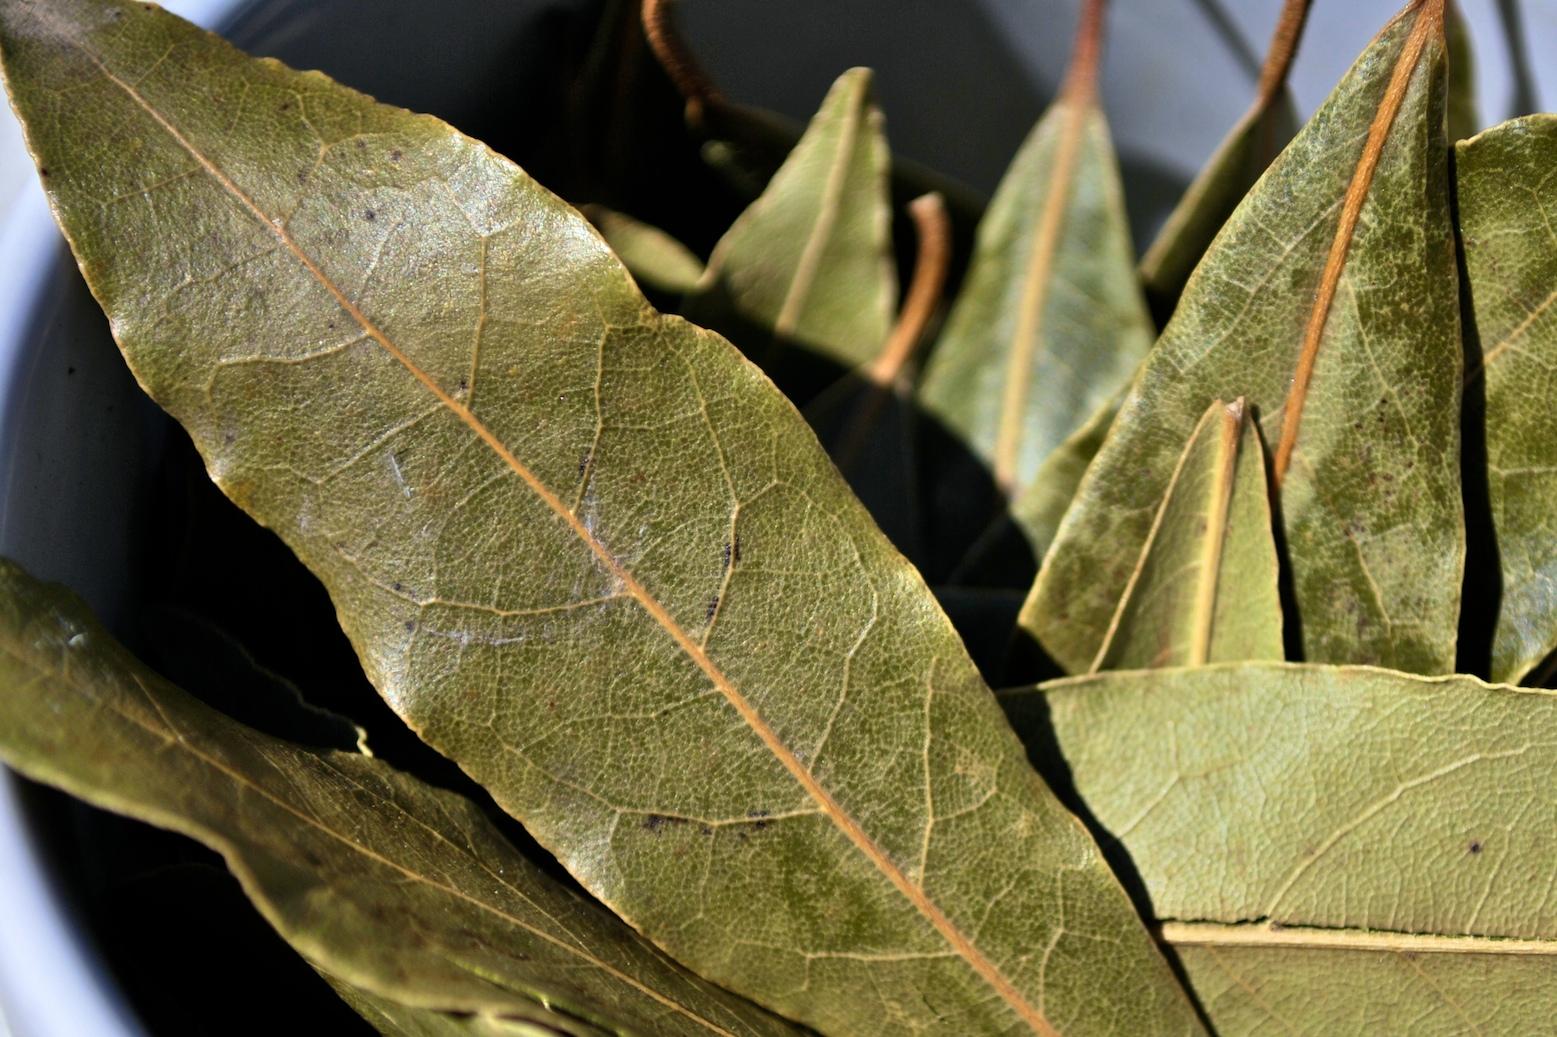 Dried Bay Leaves/Folhas de Louro